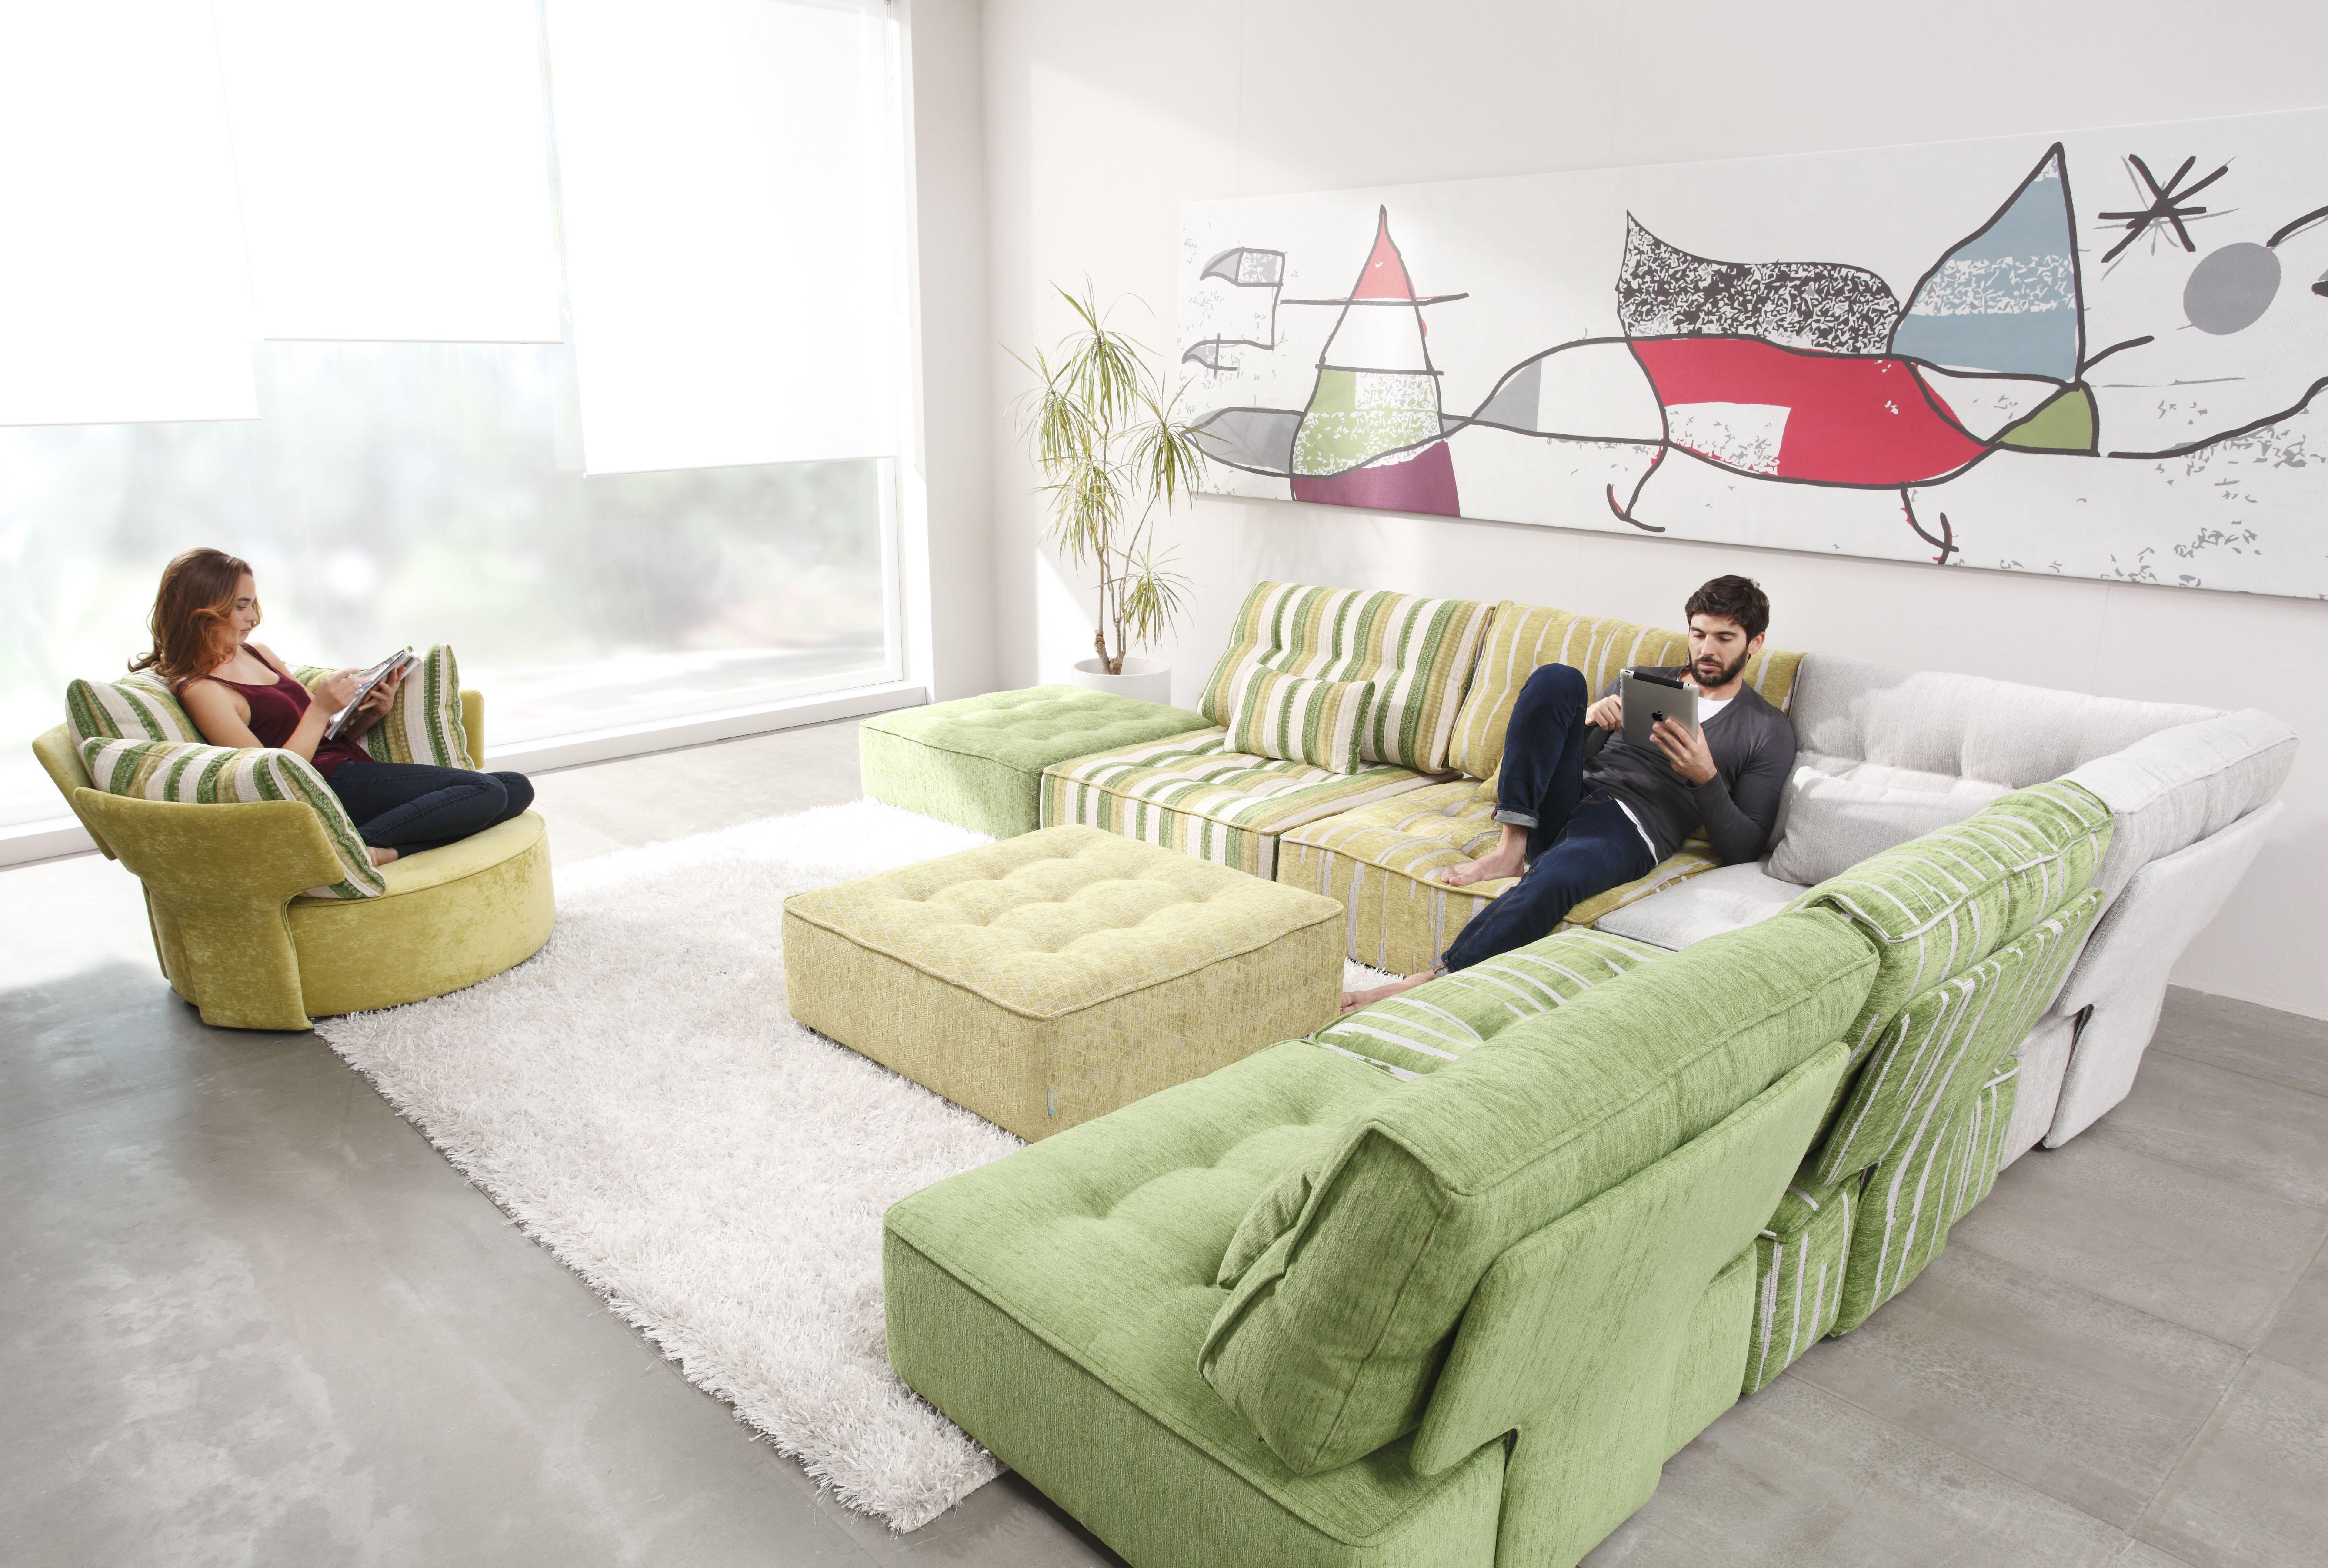 Foto 35 de Muebles en Getafe | Goga Muebles & Complementos